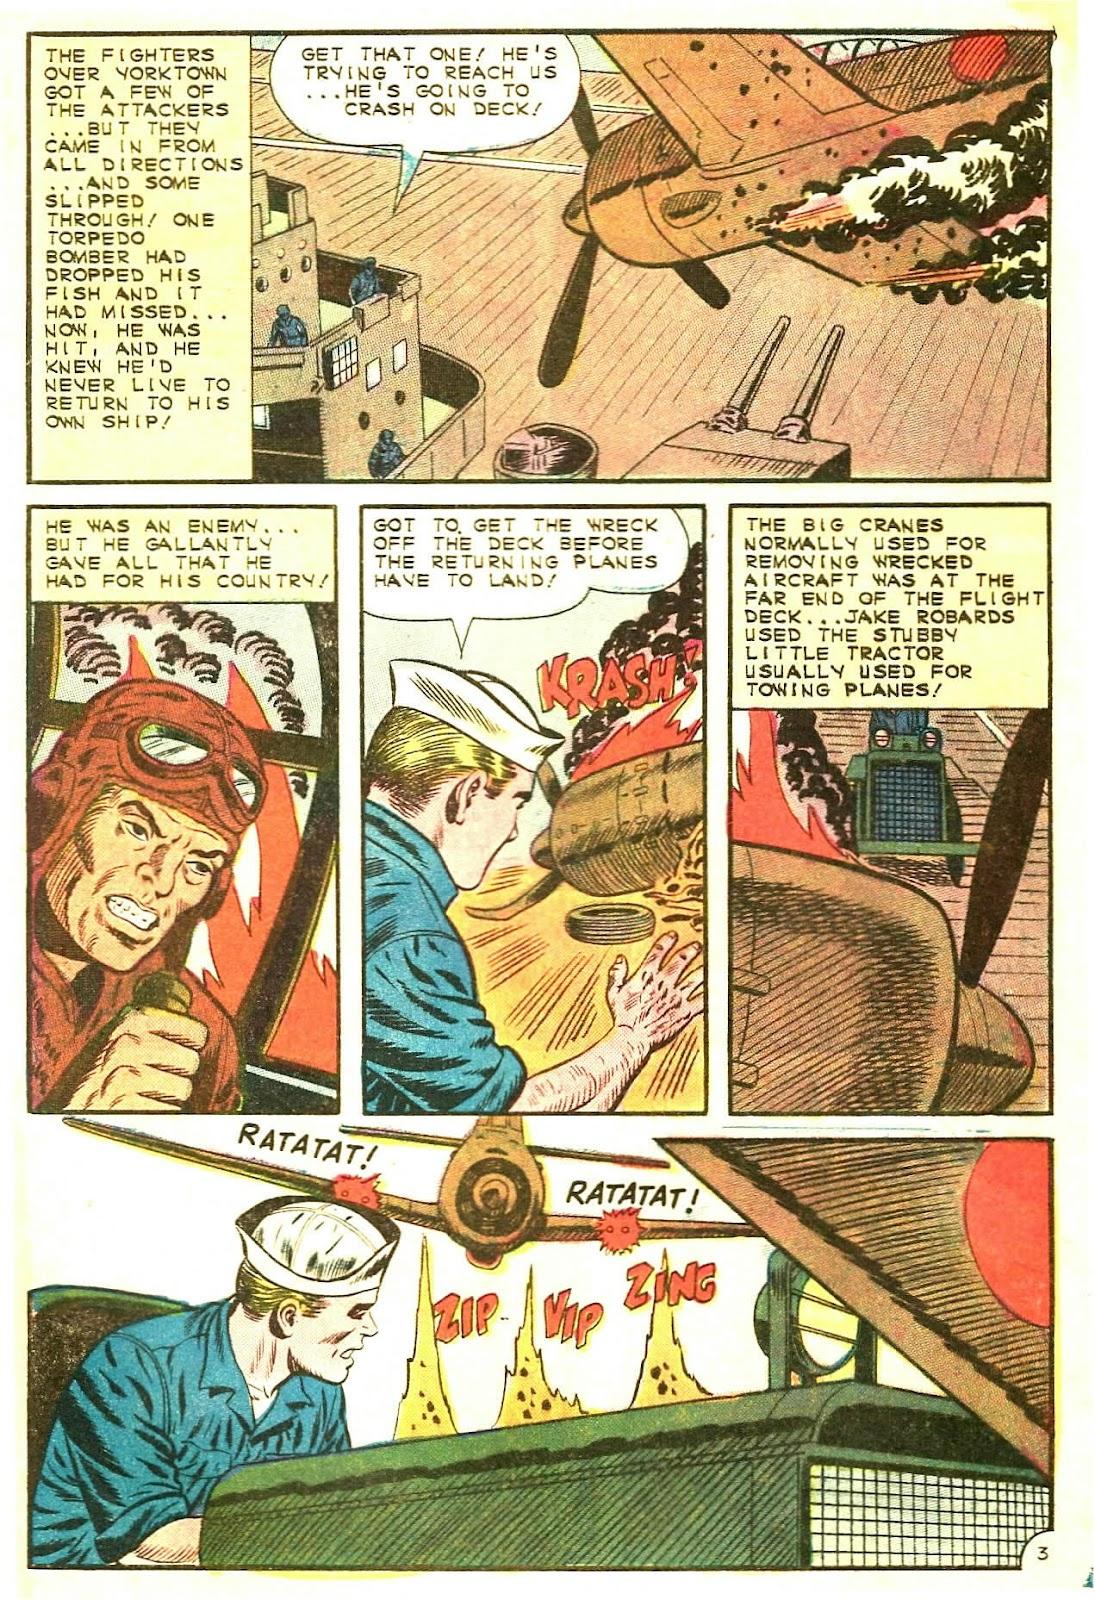 Read online Fightin' Navy comic -  Issue #125 - 5